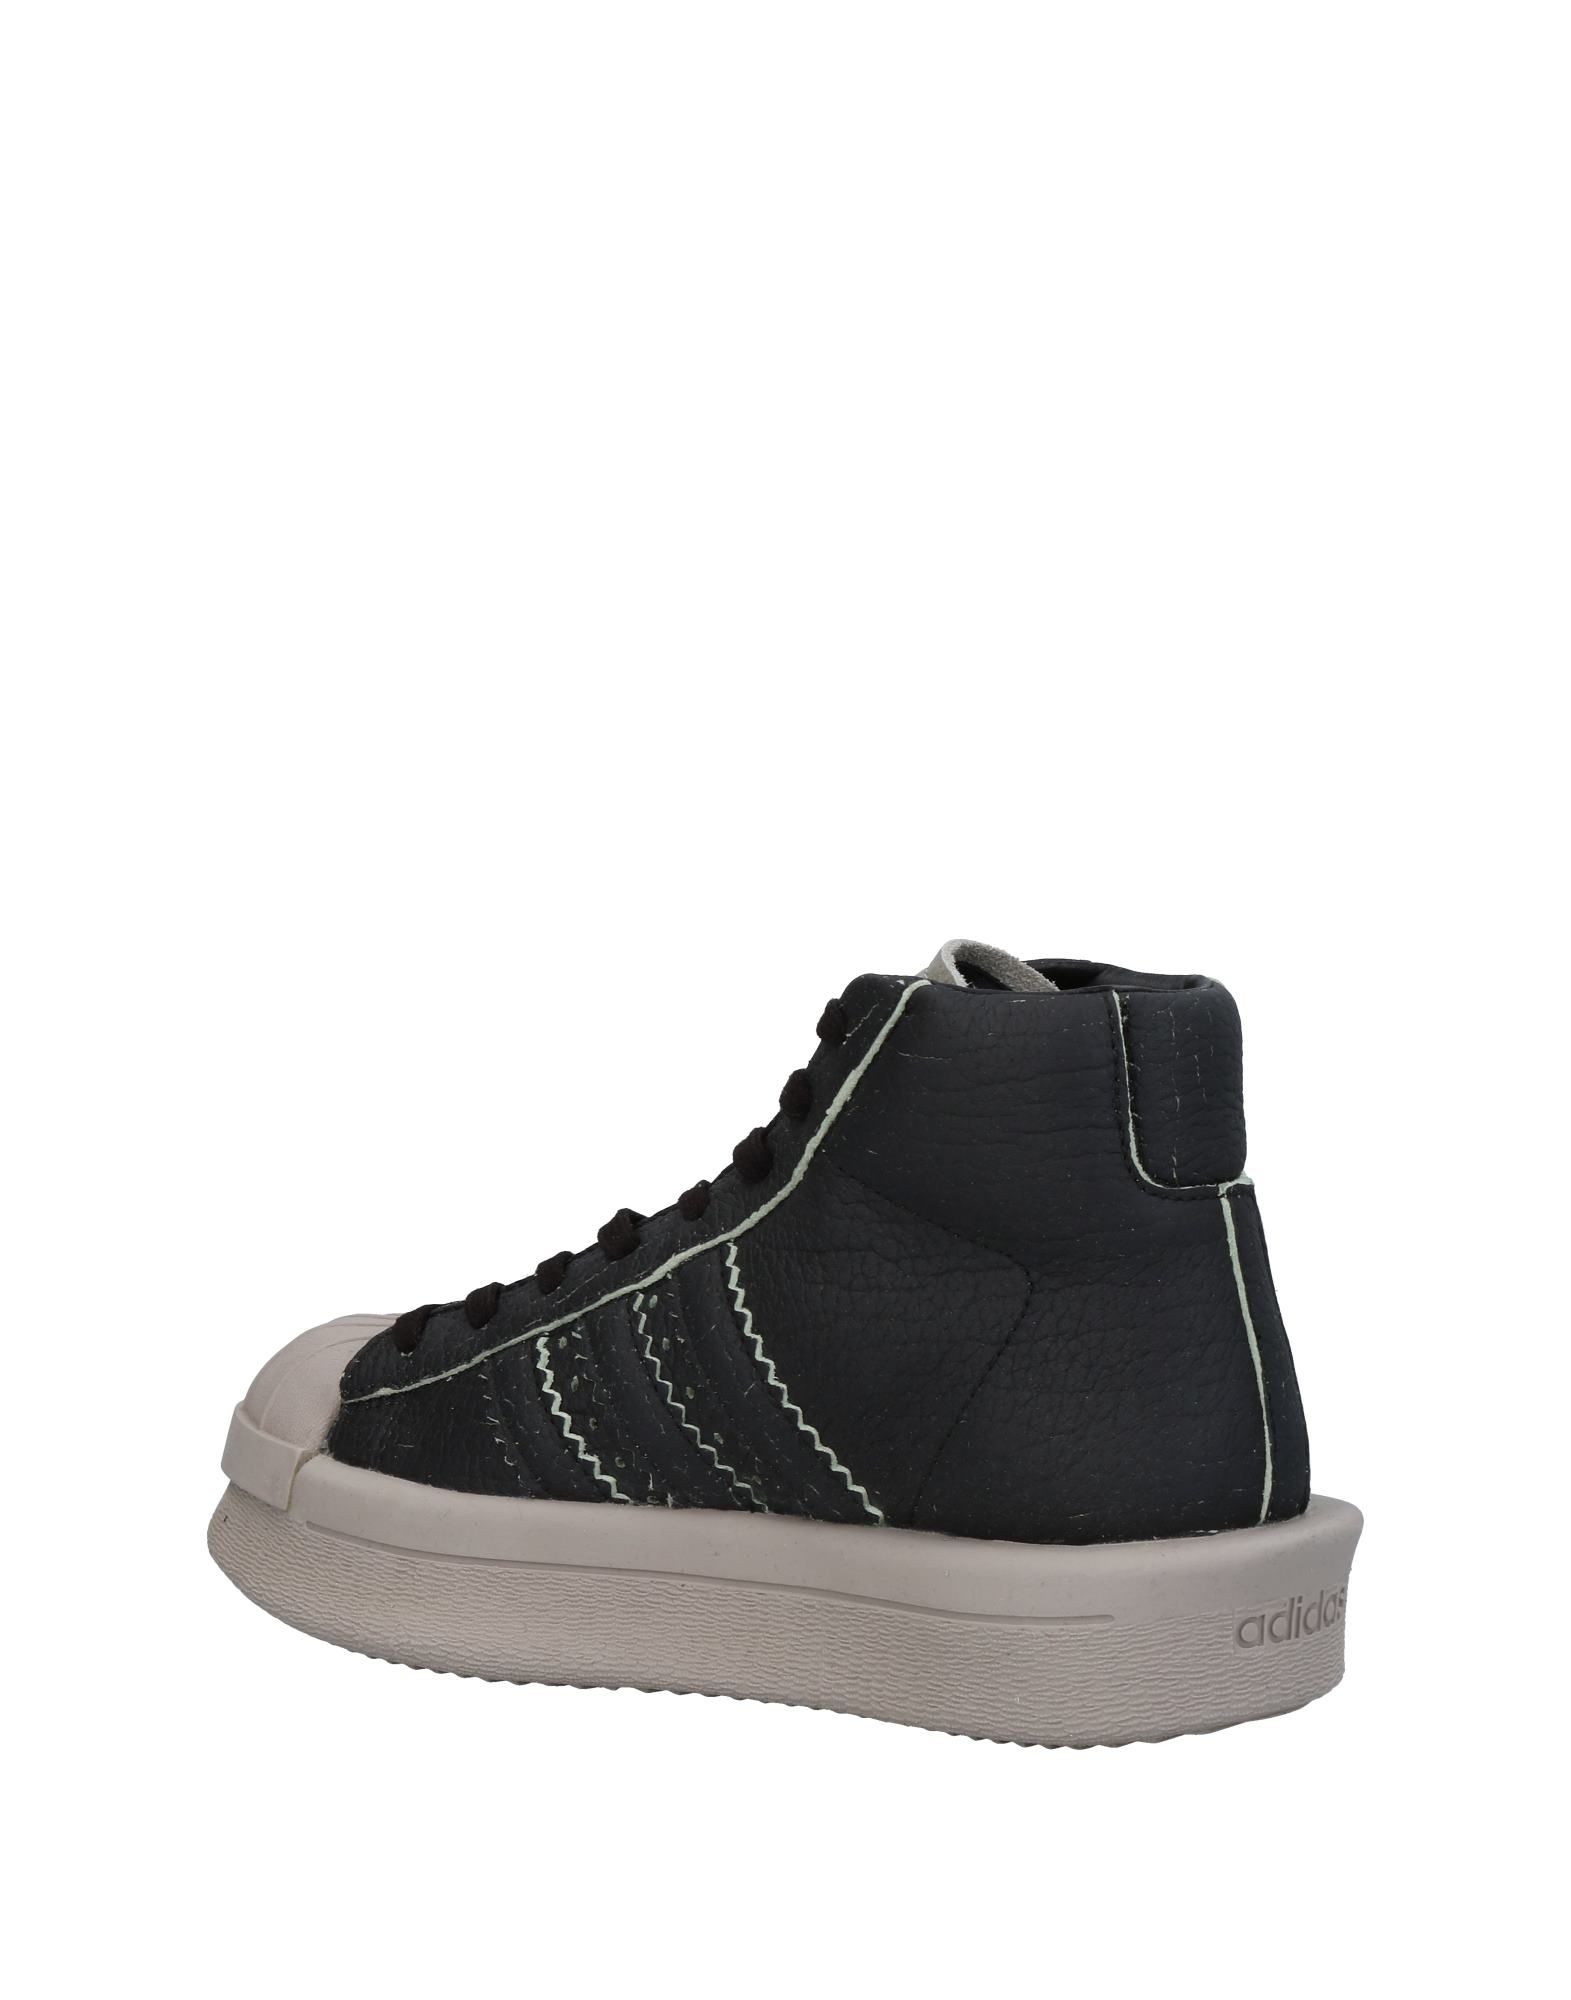 Rick Owens  X Adidas Sneakers Damen  Owens 11391759NVGünstige gut aussehende Schuhe b21dbf